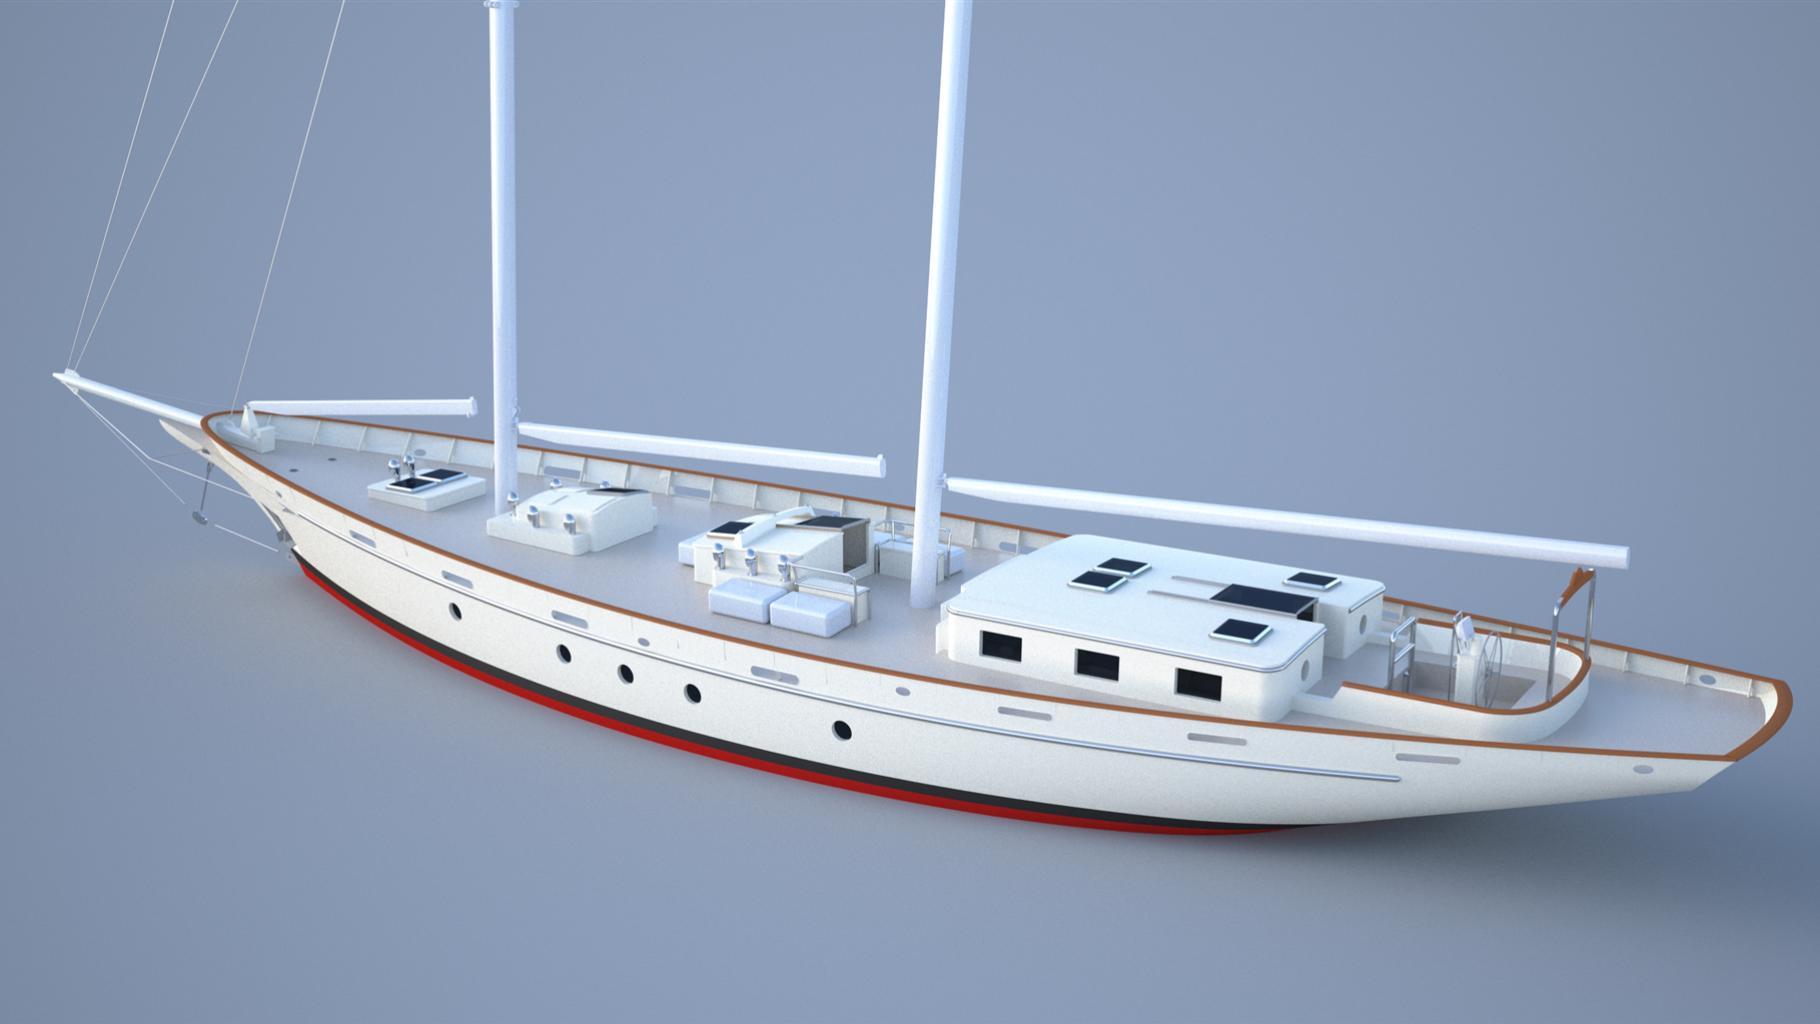 vela sailing yacht marsun 34m 2019 rendering